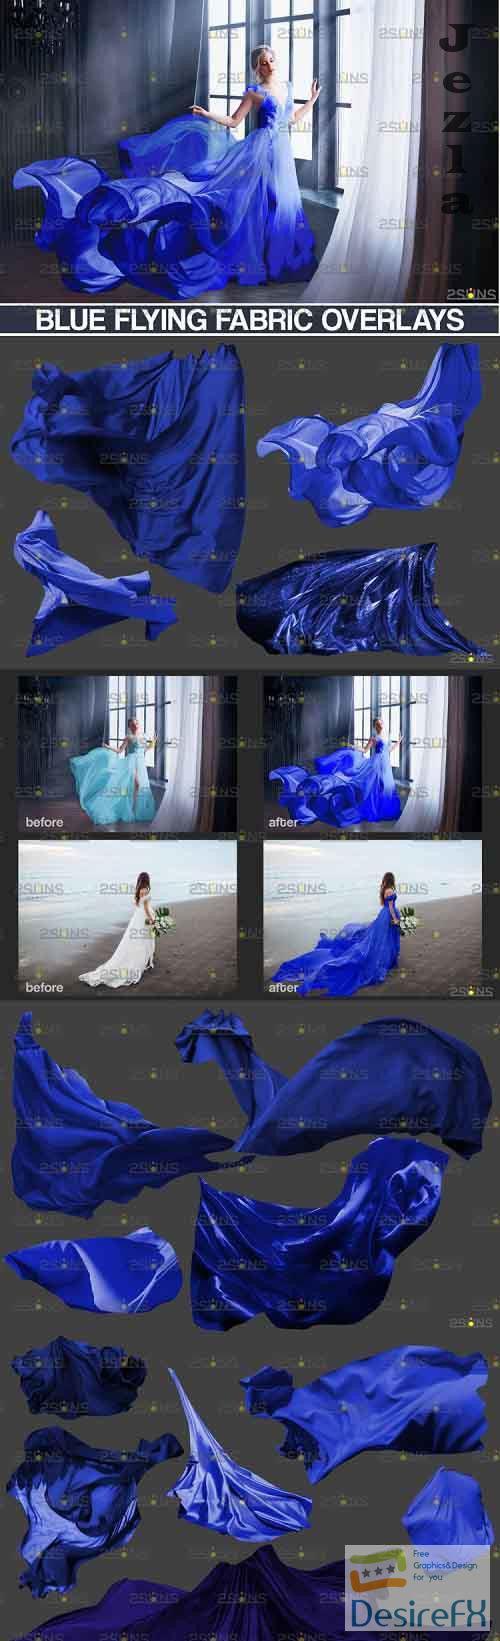 Flying Fabric overlays, Photoshop overlay Flying dress - 898227